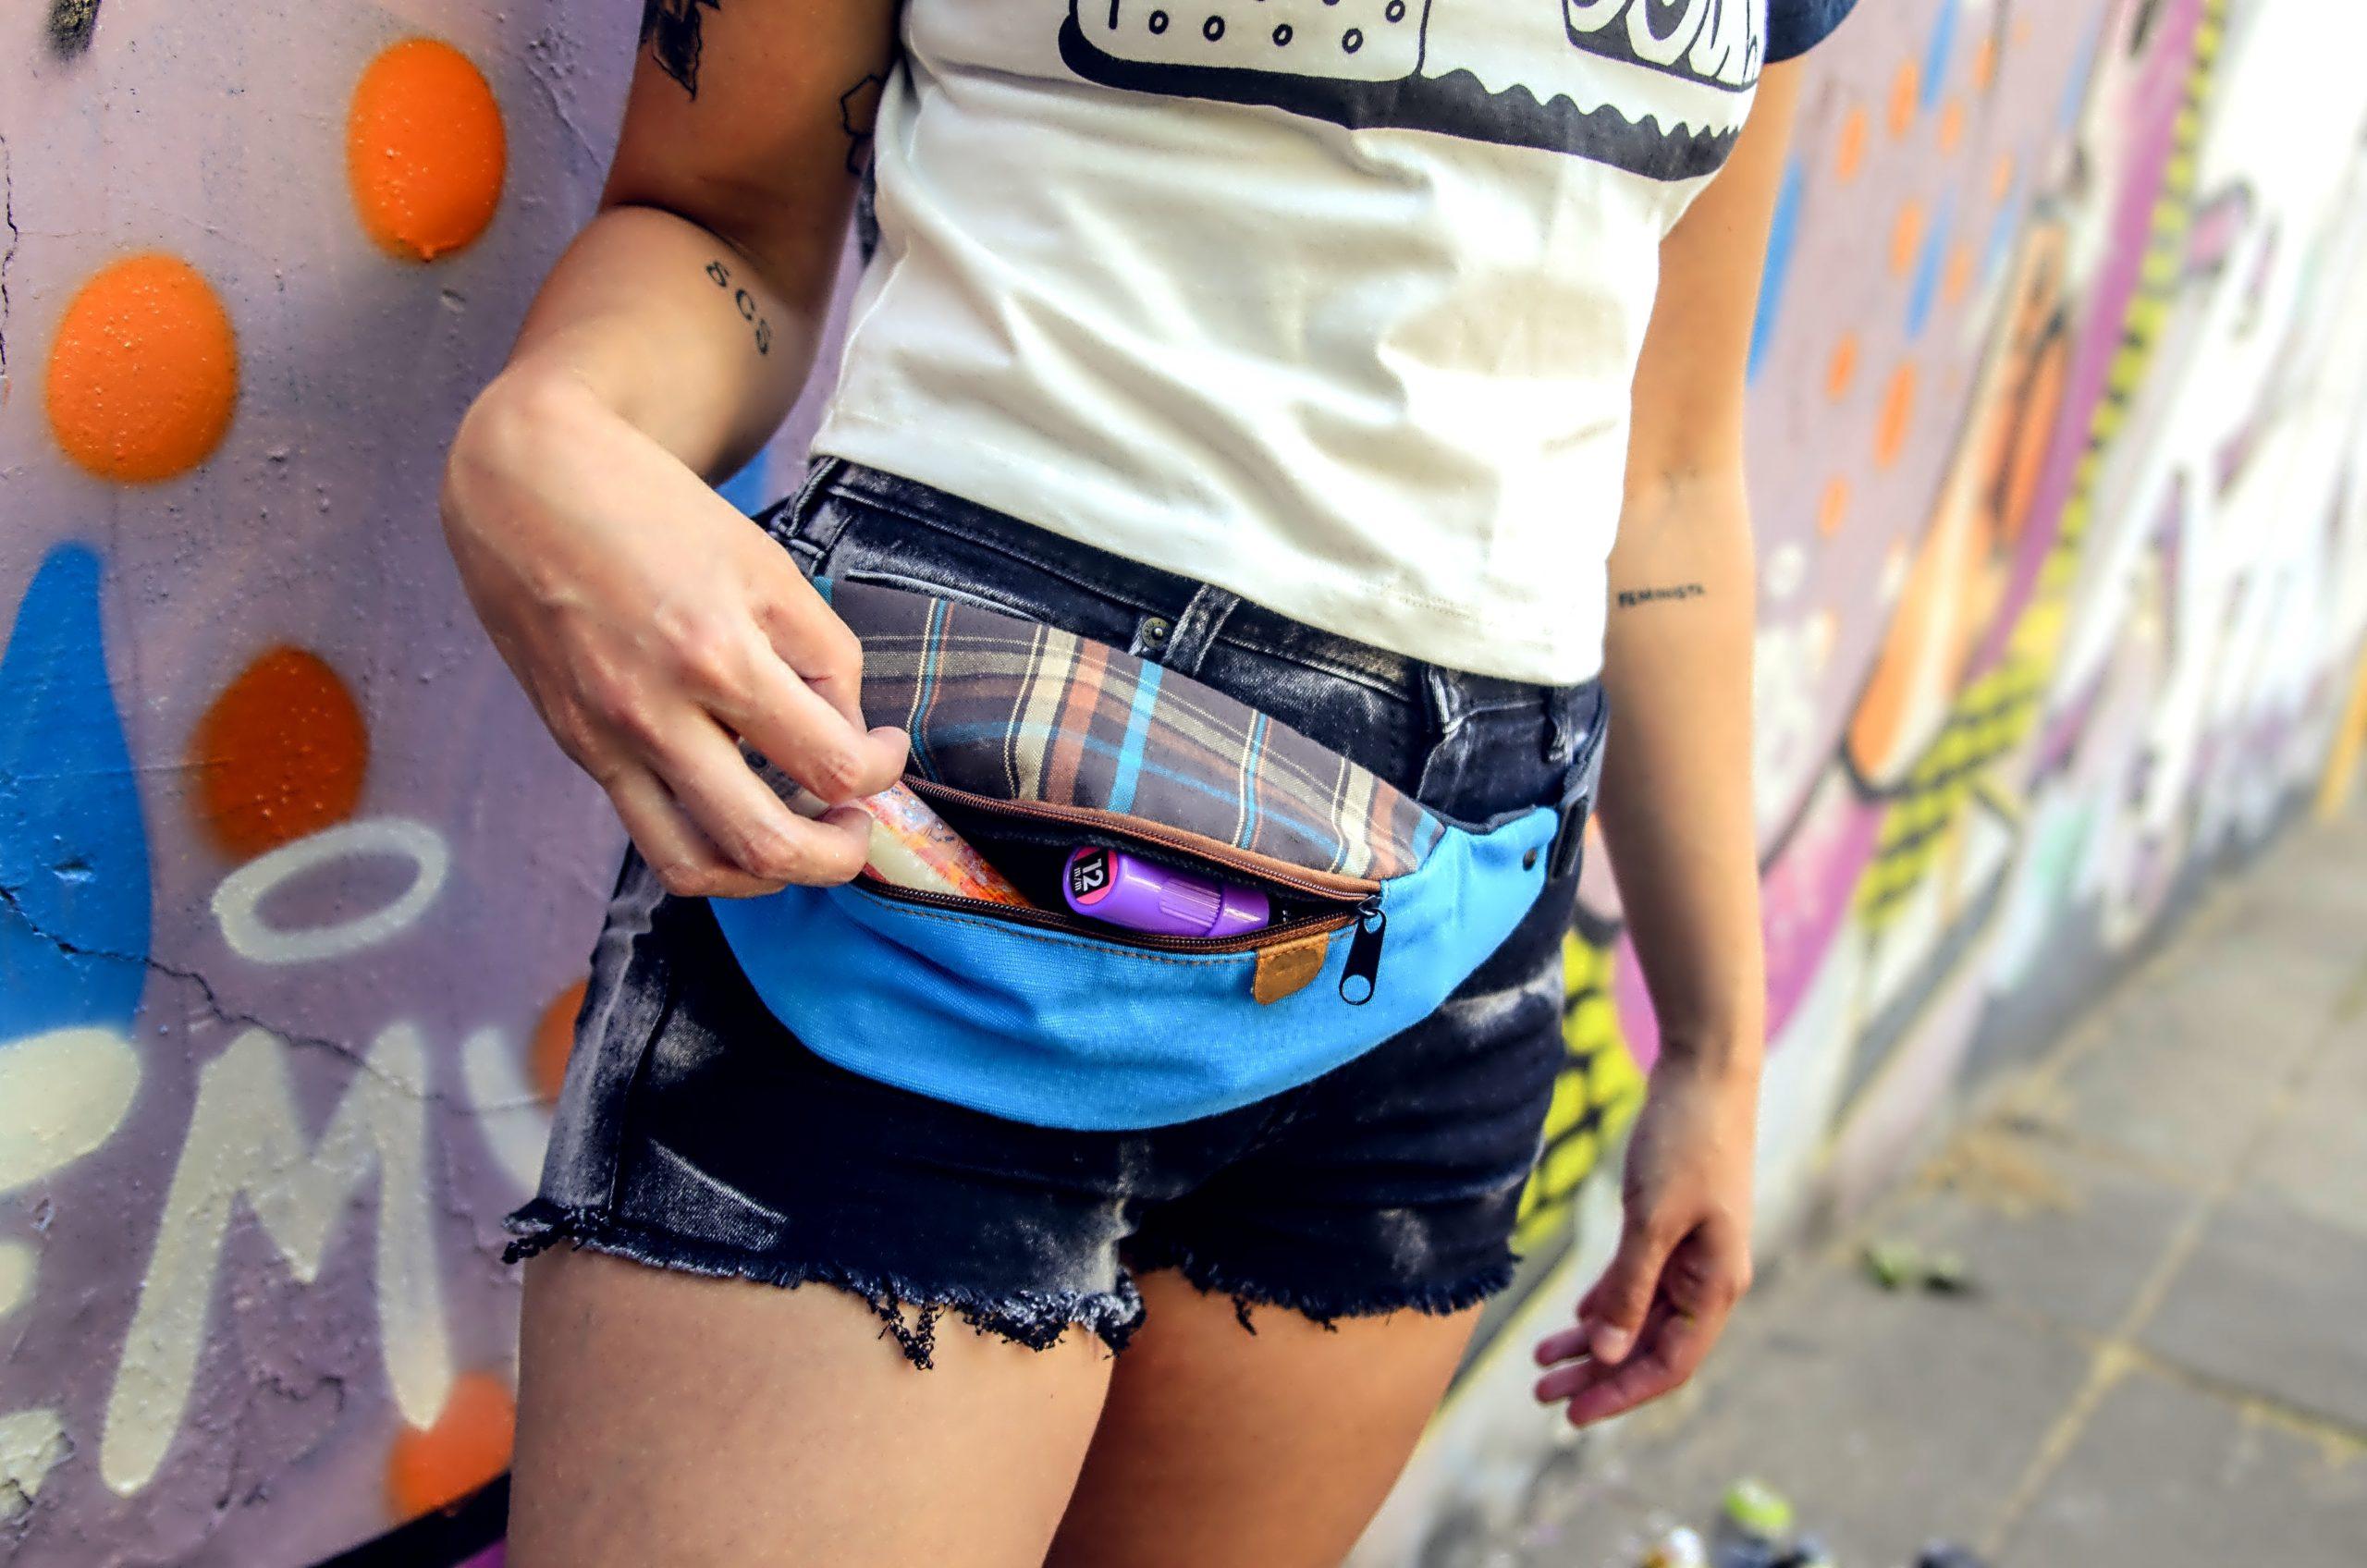 Mujer usando una riñonera estilo urbano